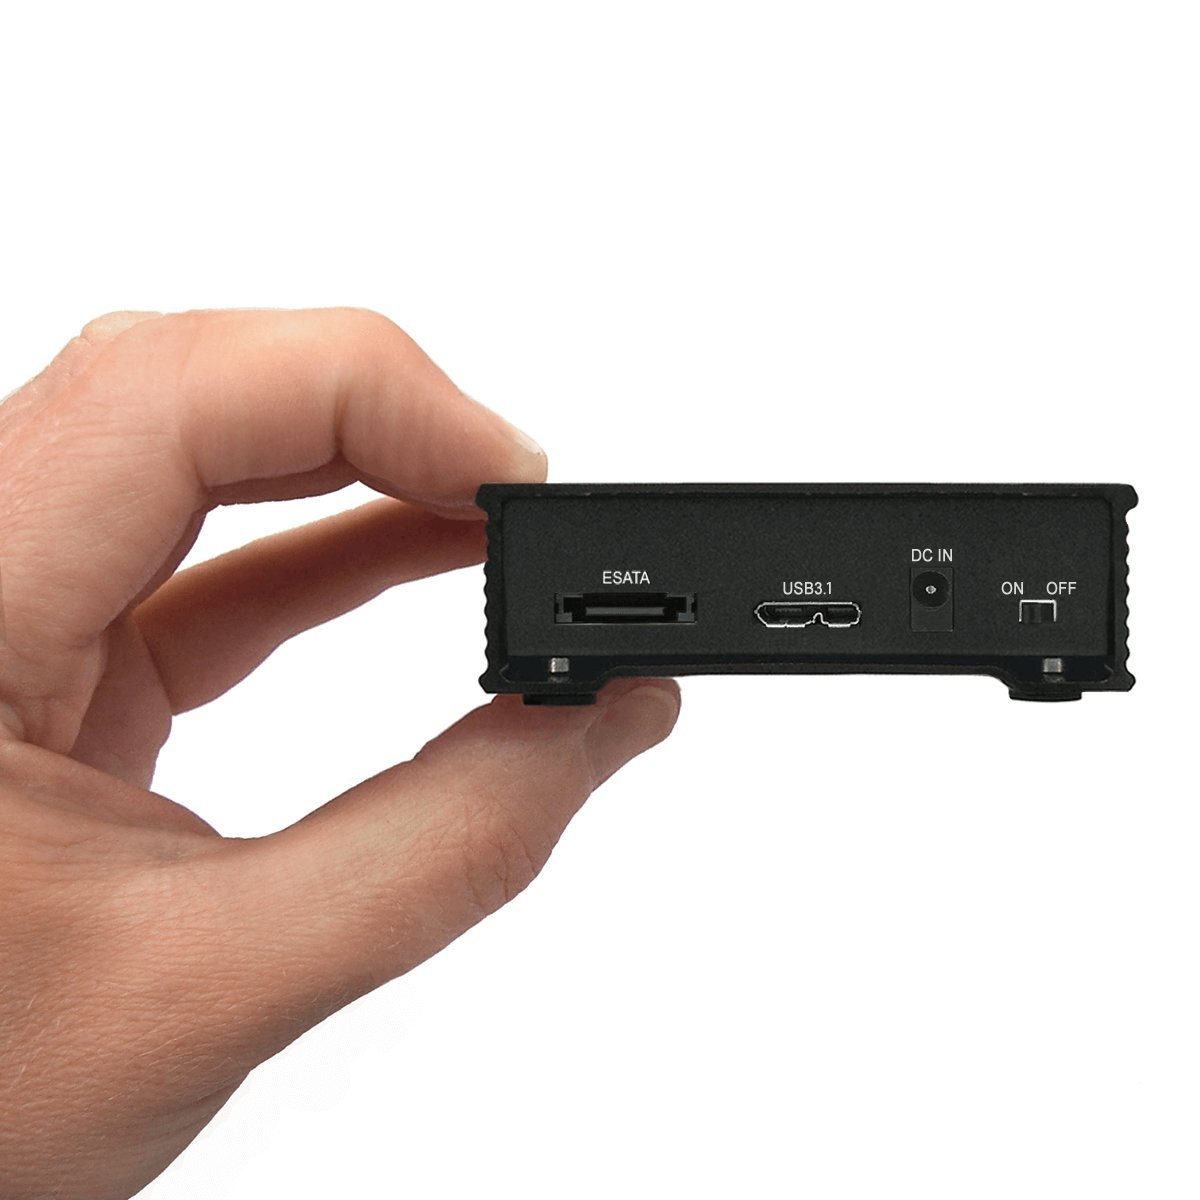 Amazon Com Minipro 2tb External Esata Usb 3 1 Portable Hard Drive Computers Accessories